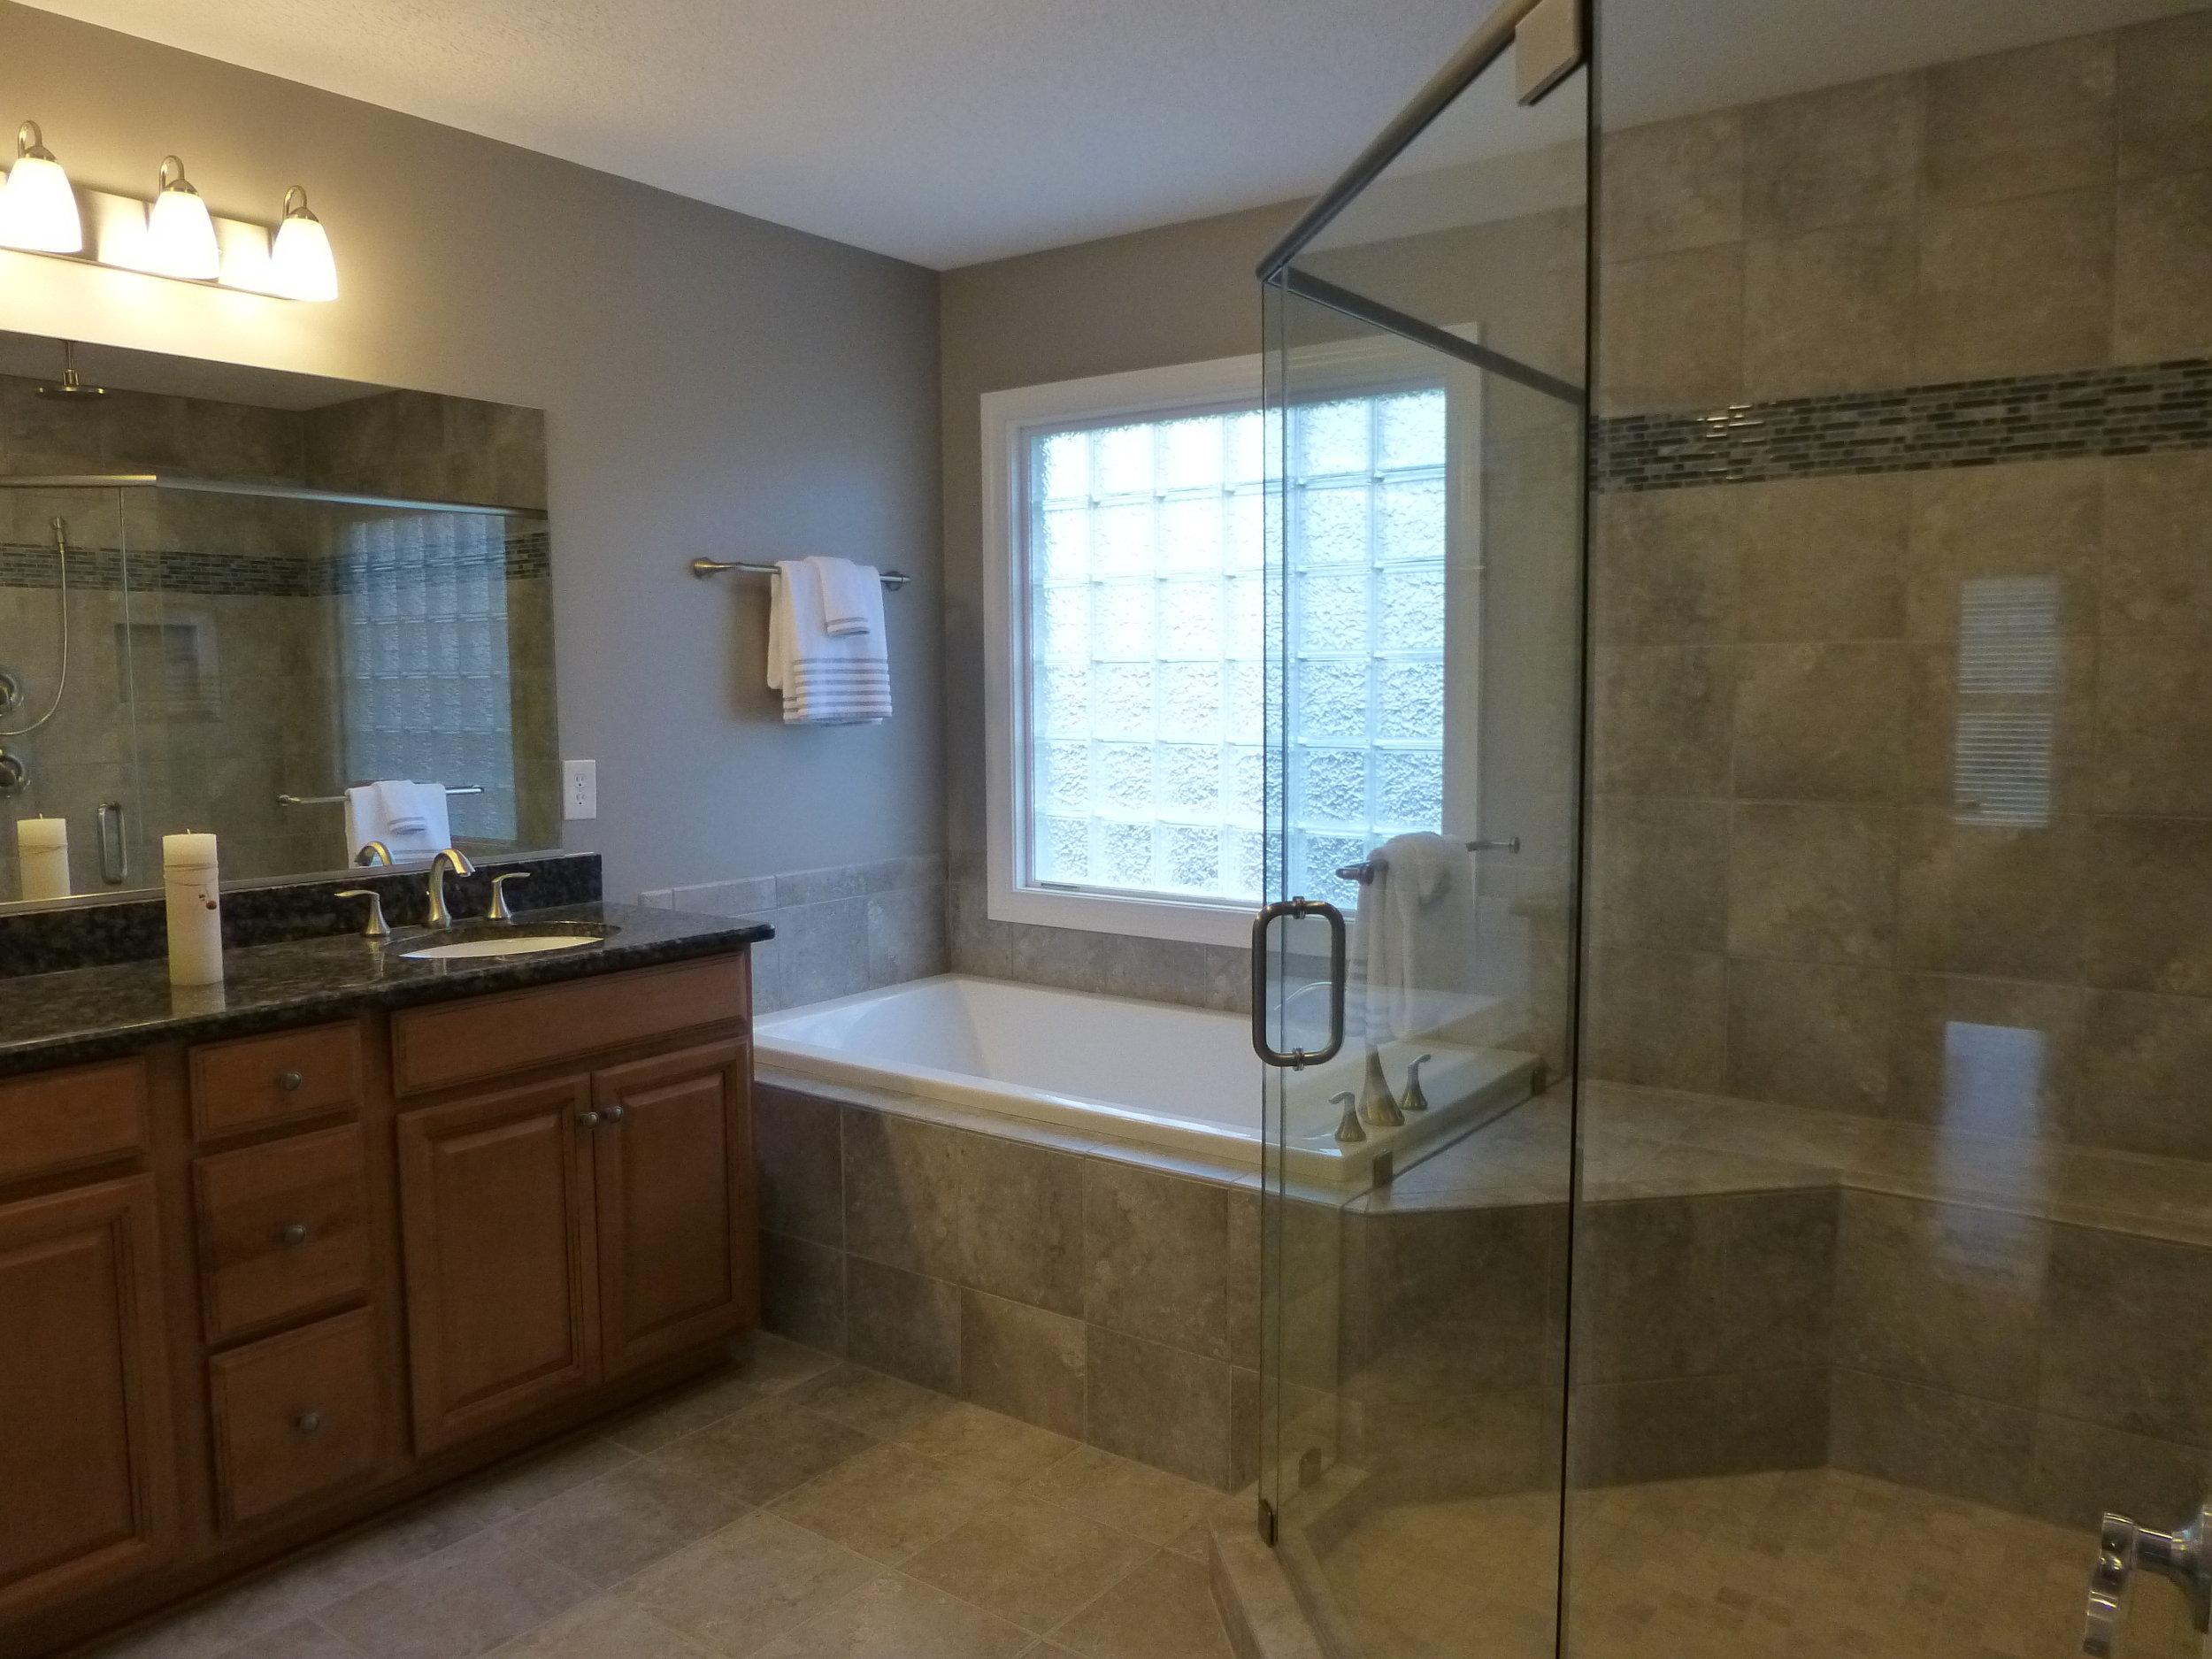 09 Kentwood Master Bath.JPG